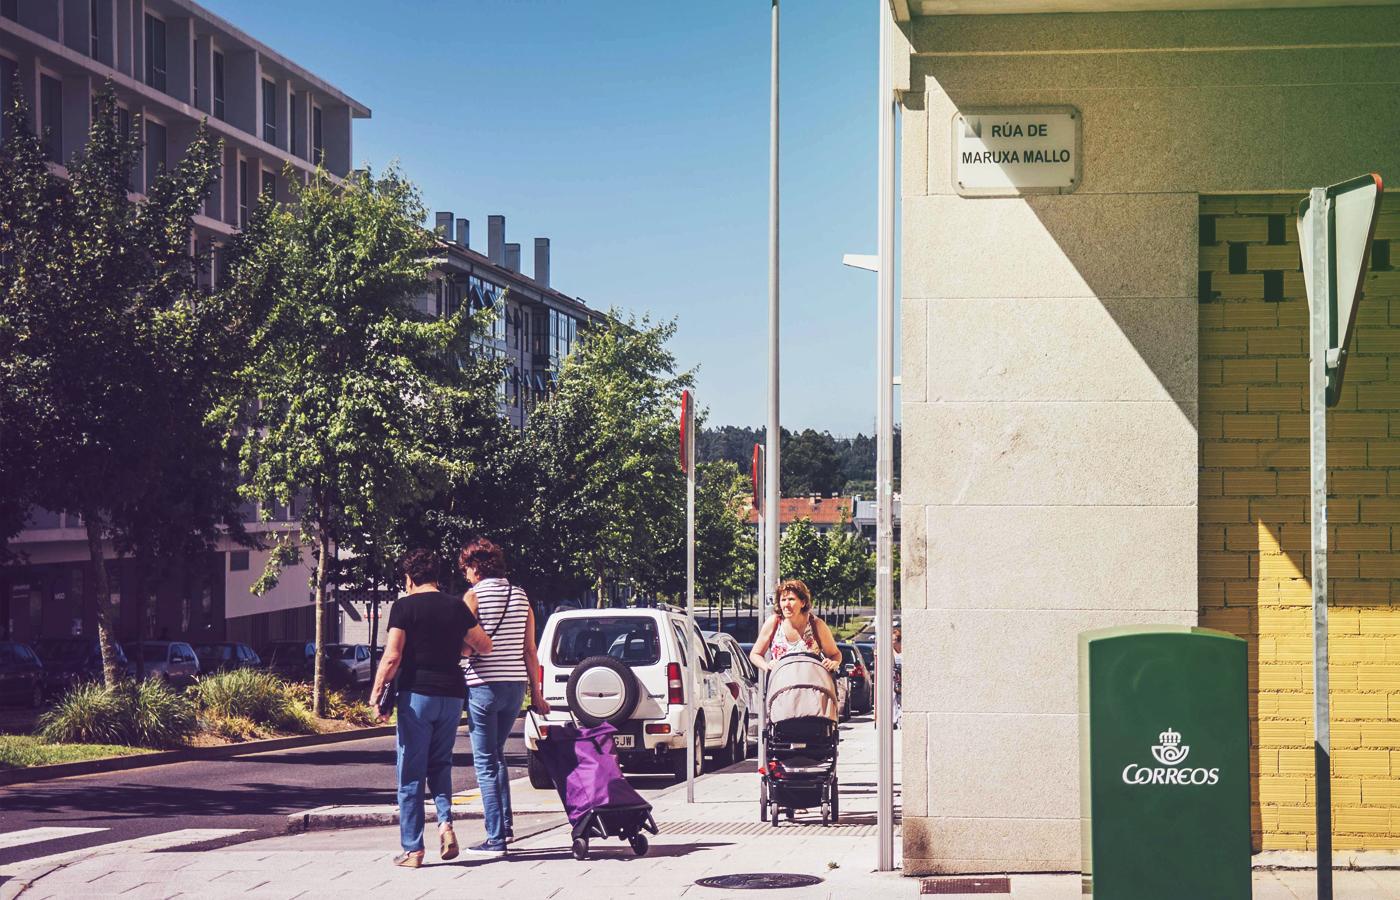 tm_compostela_toponimia_urbana_10